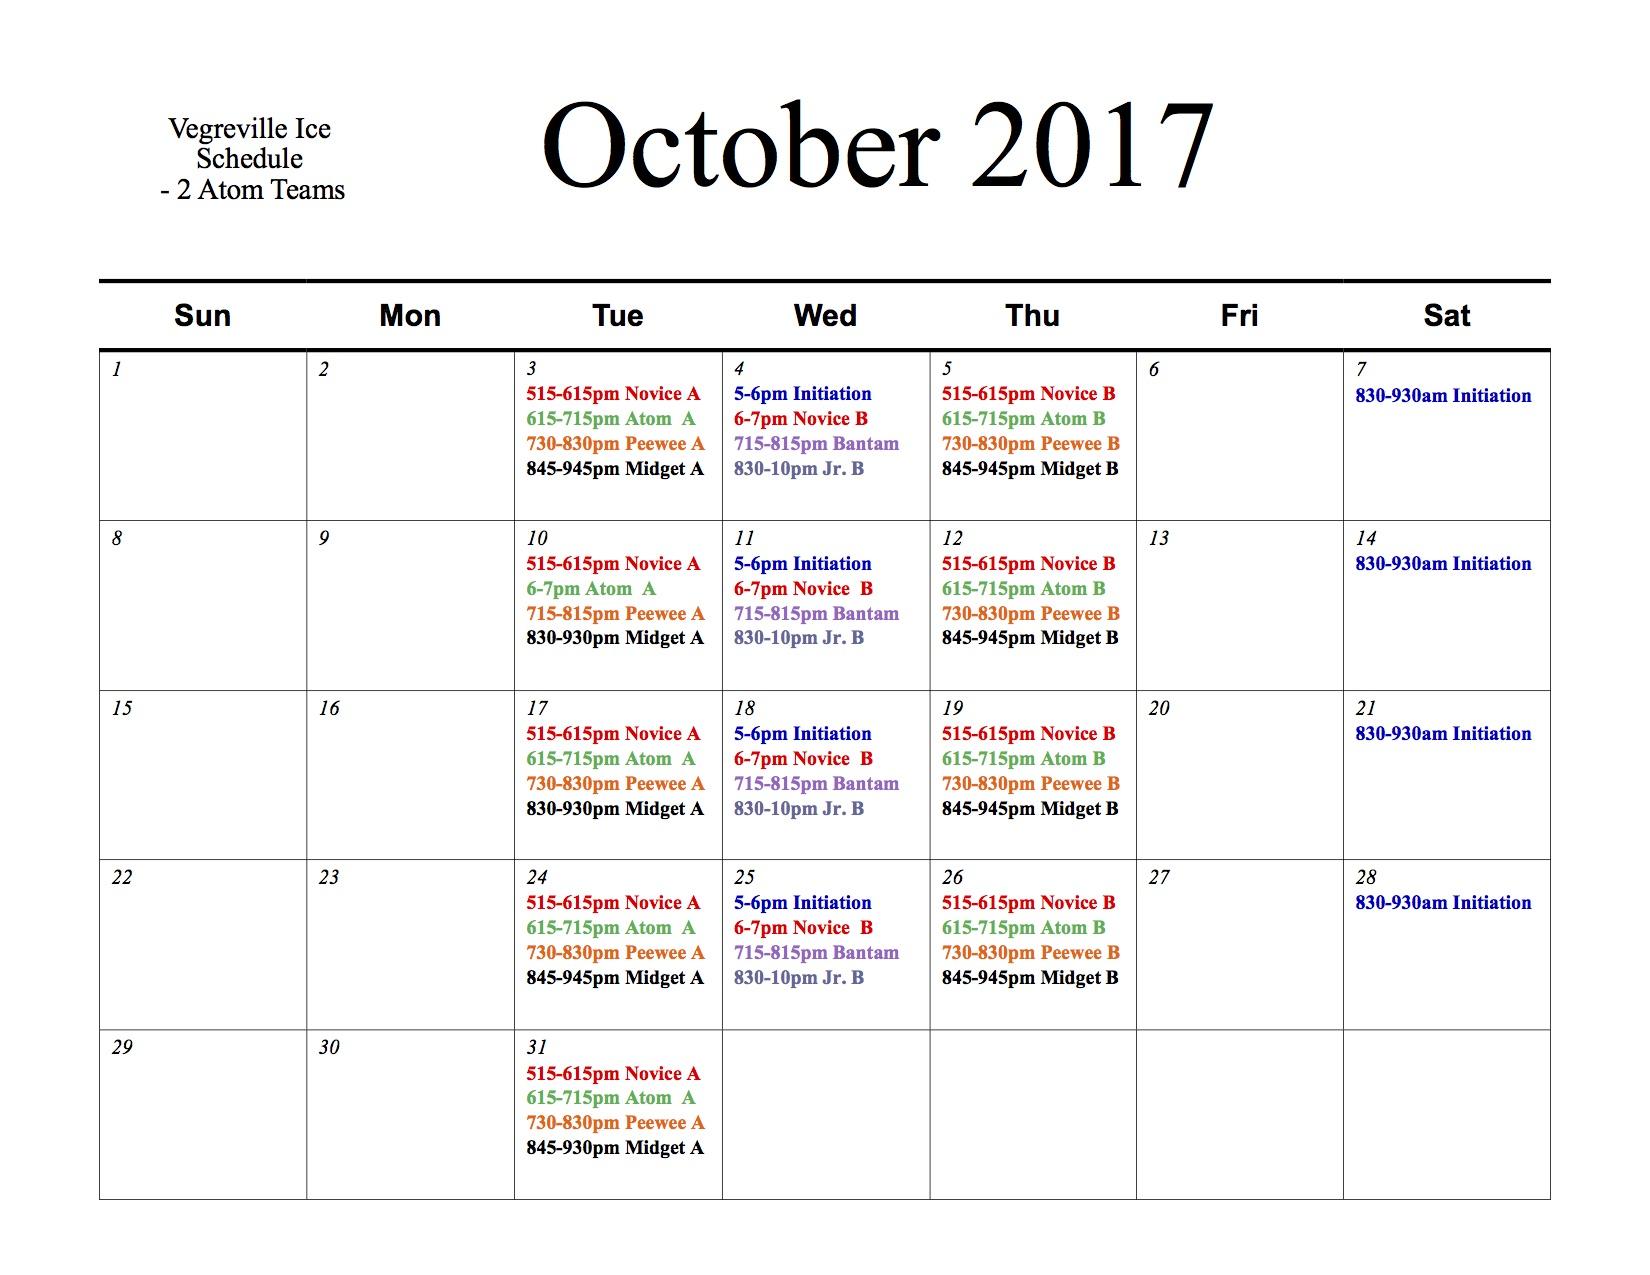 Veg Schedule Oct 2017